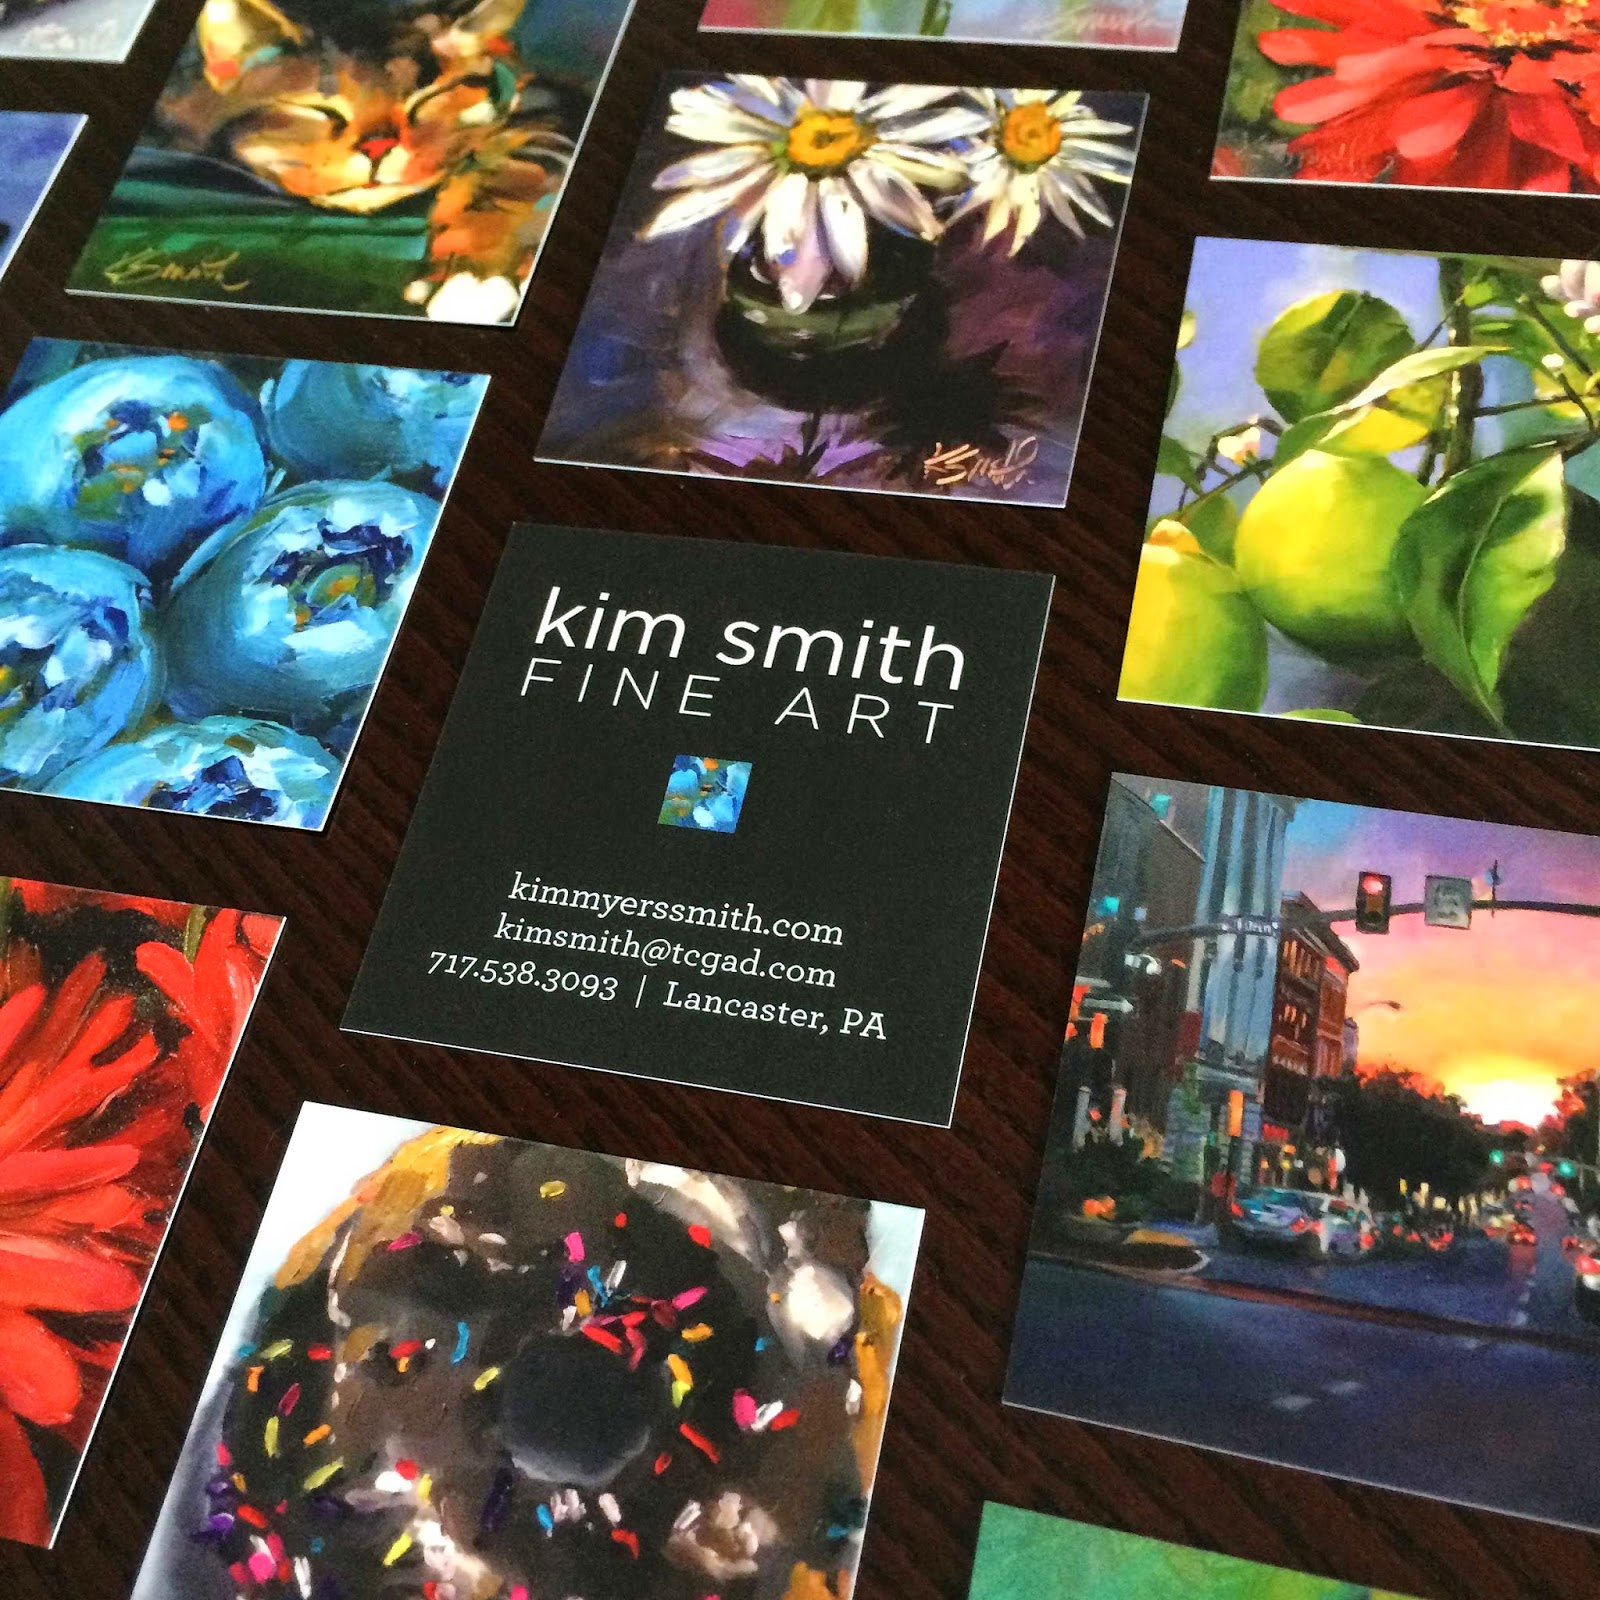 kim smith fine art january 2015